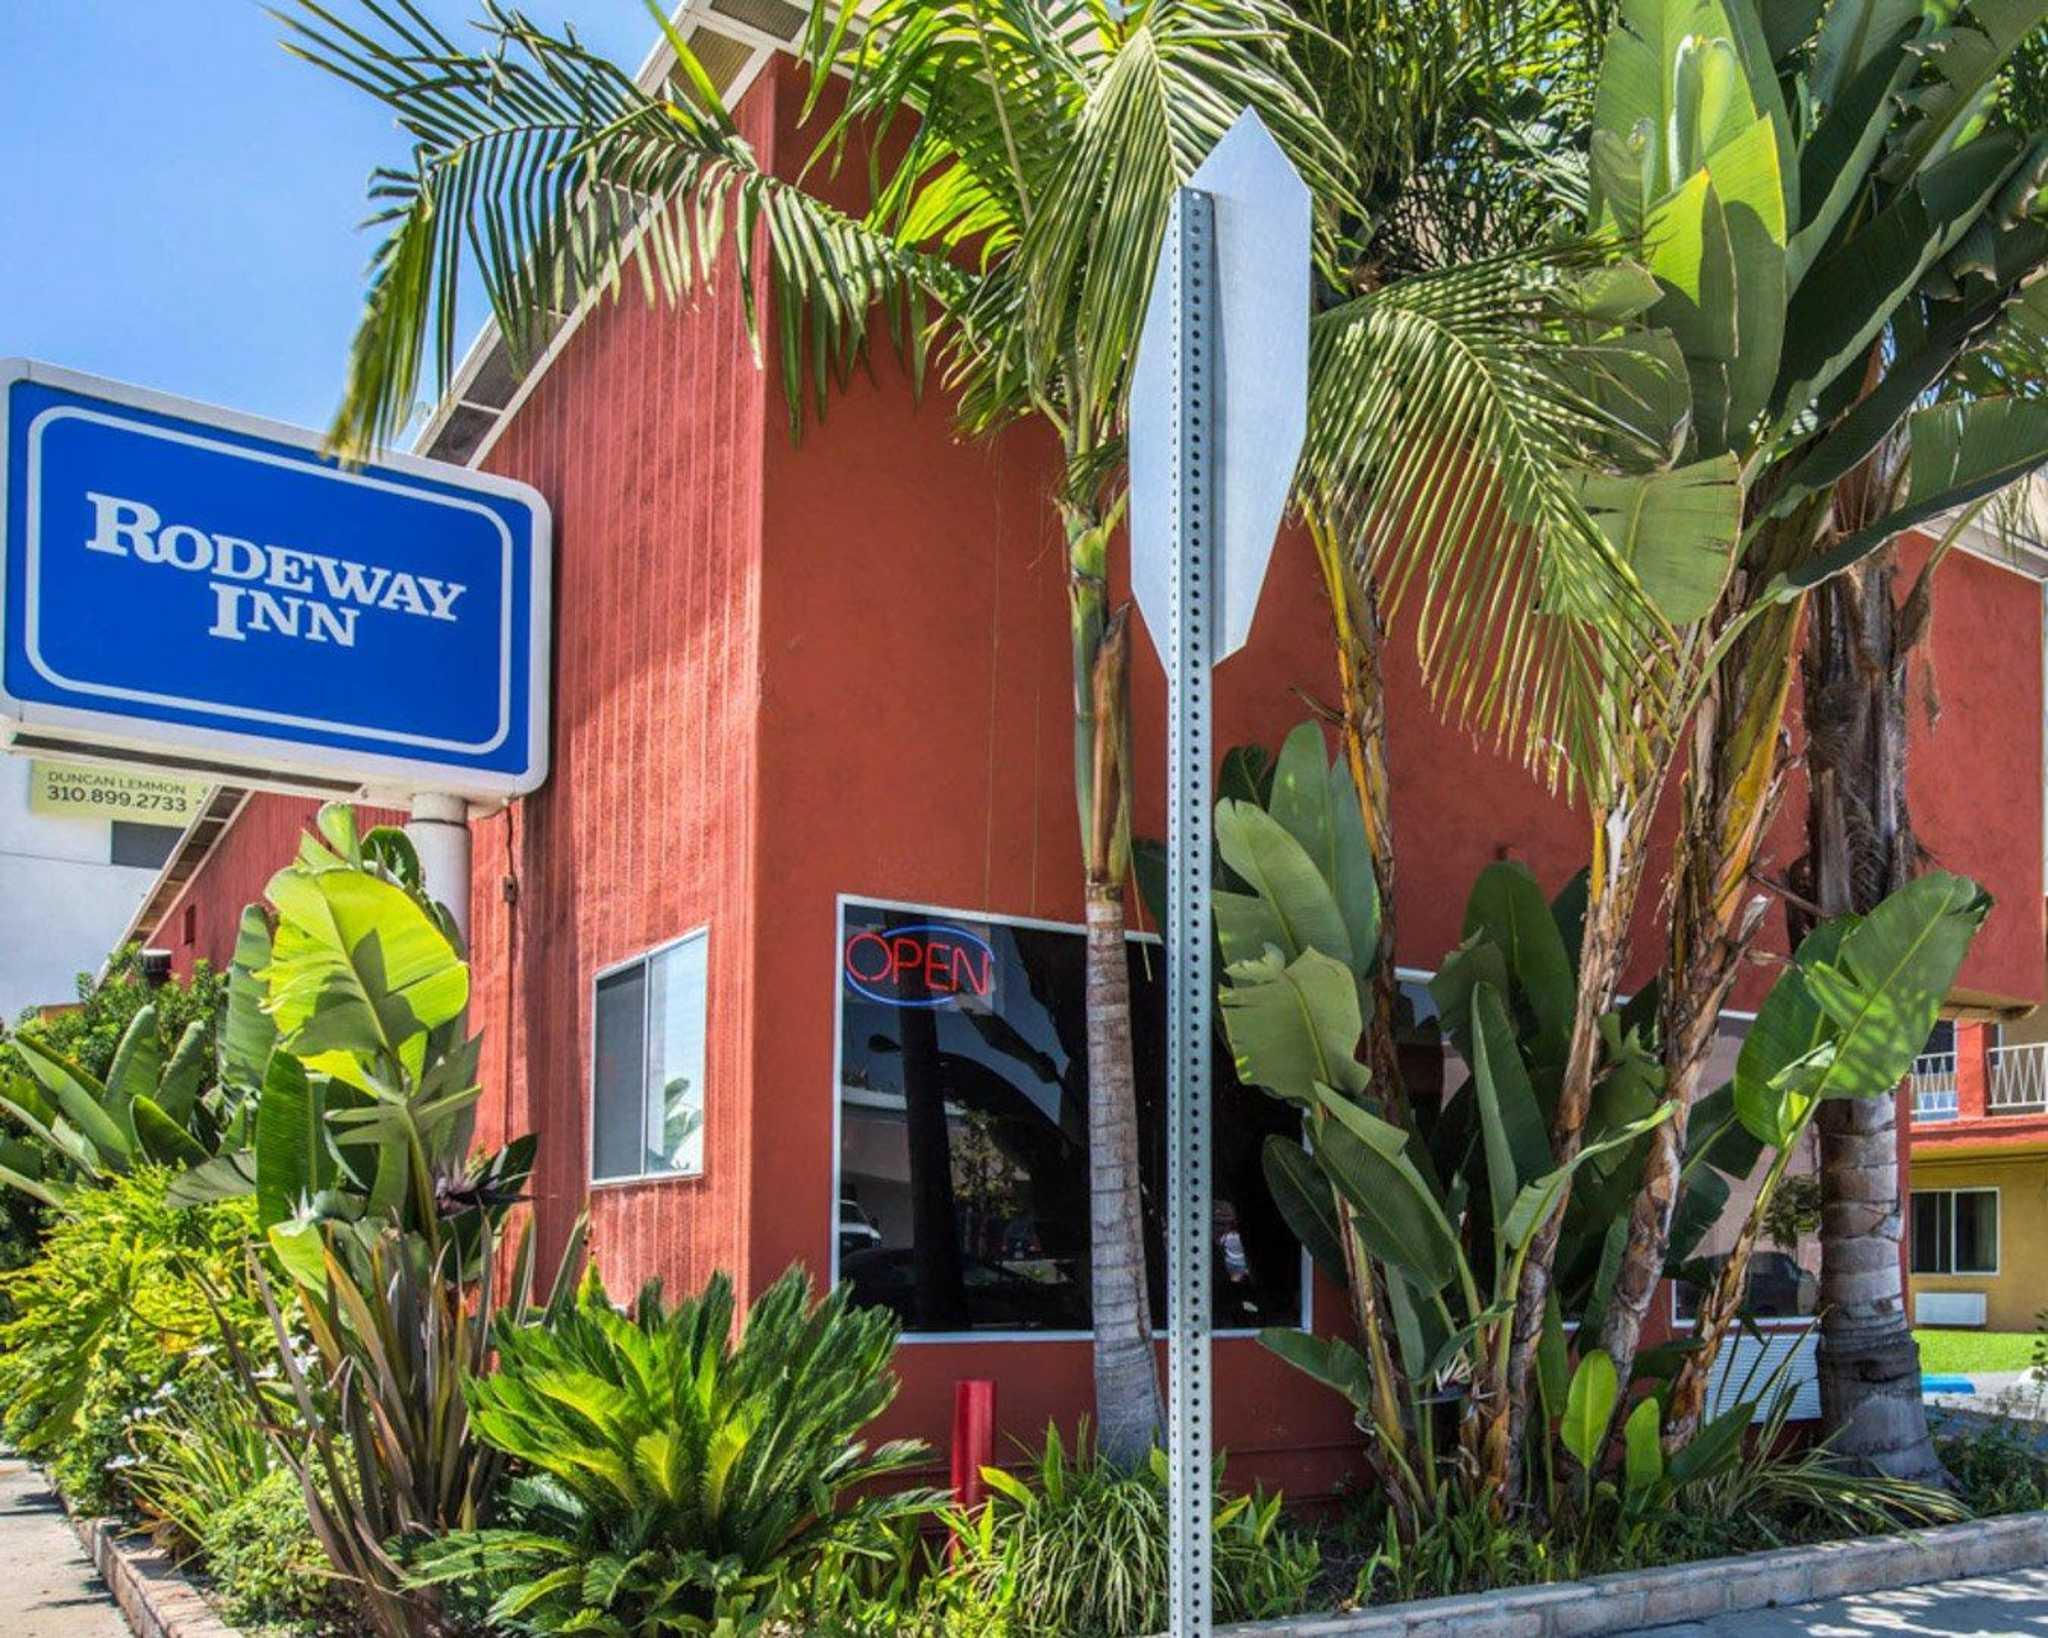 Rodeway Inn near Venice Beach image 1